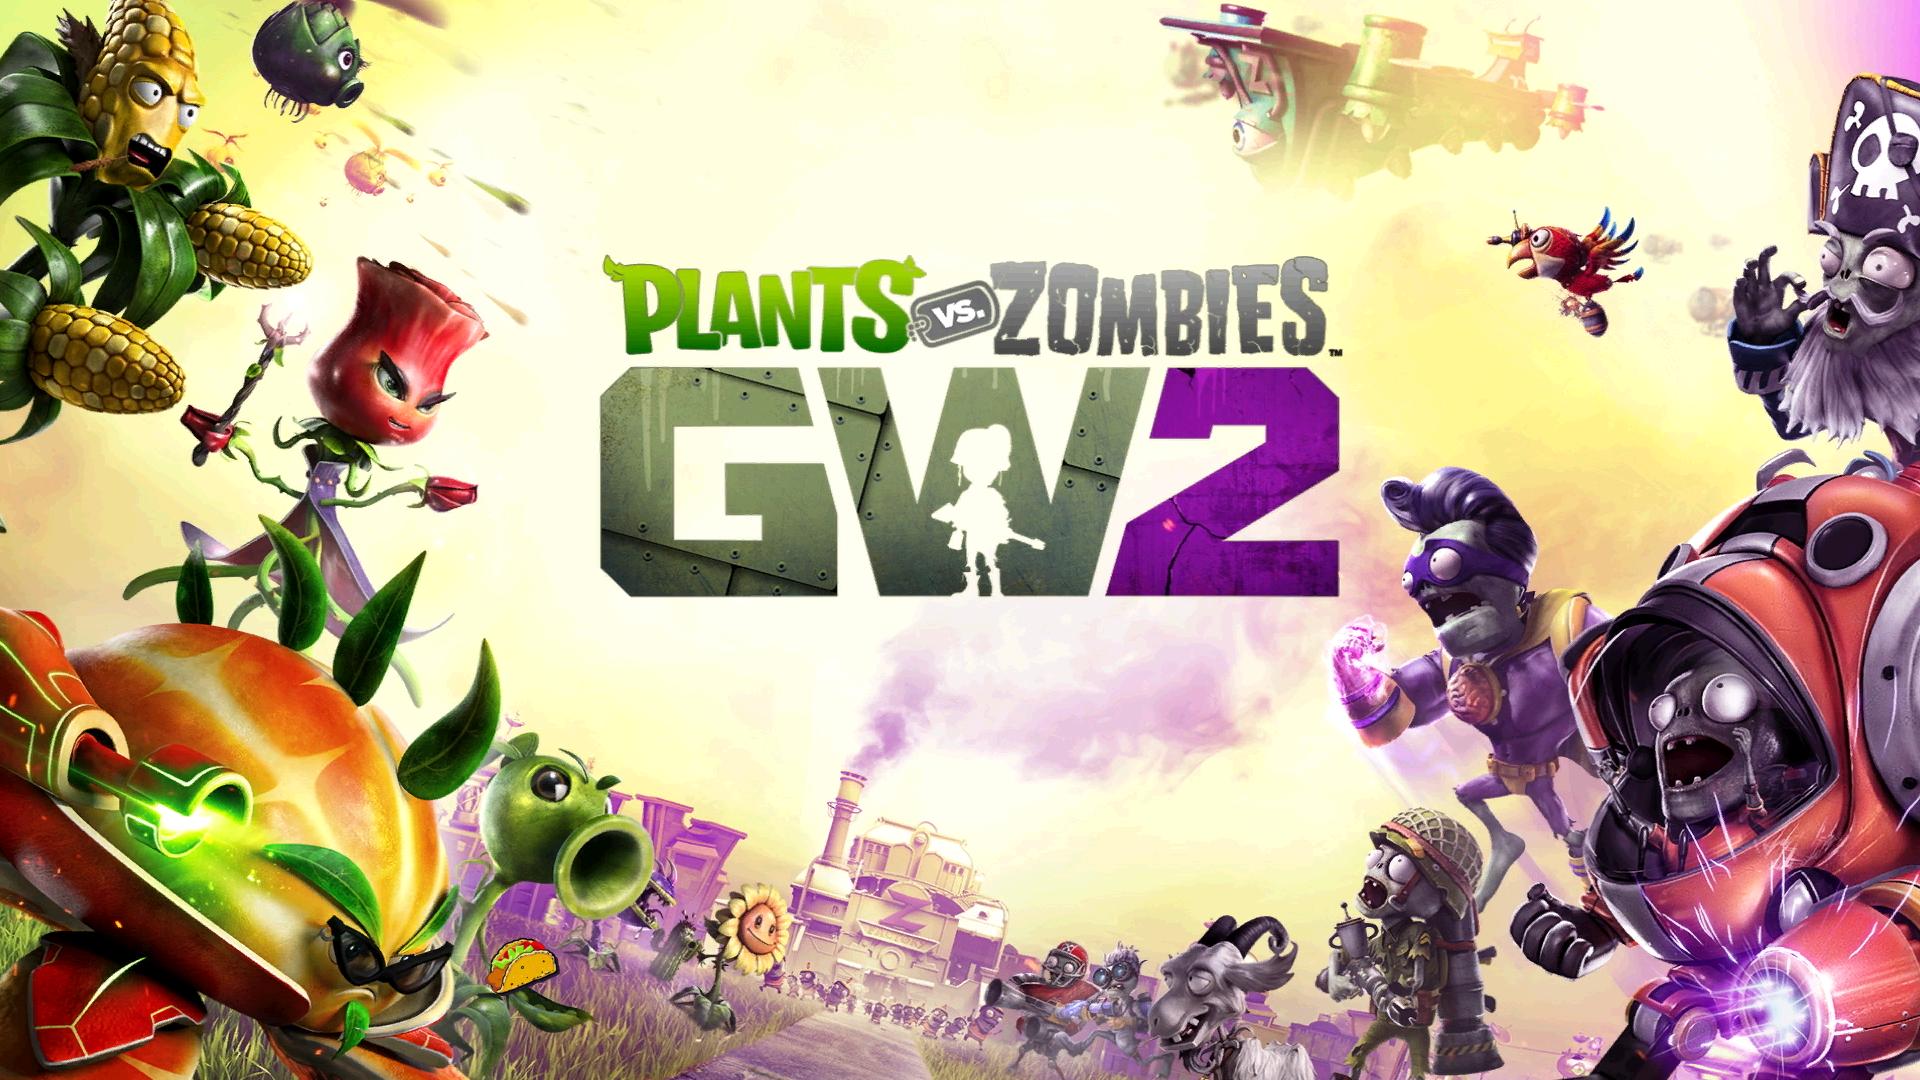 Preview Plants Vs Zombies Garden Warfare 2 Xbox One 1080p